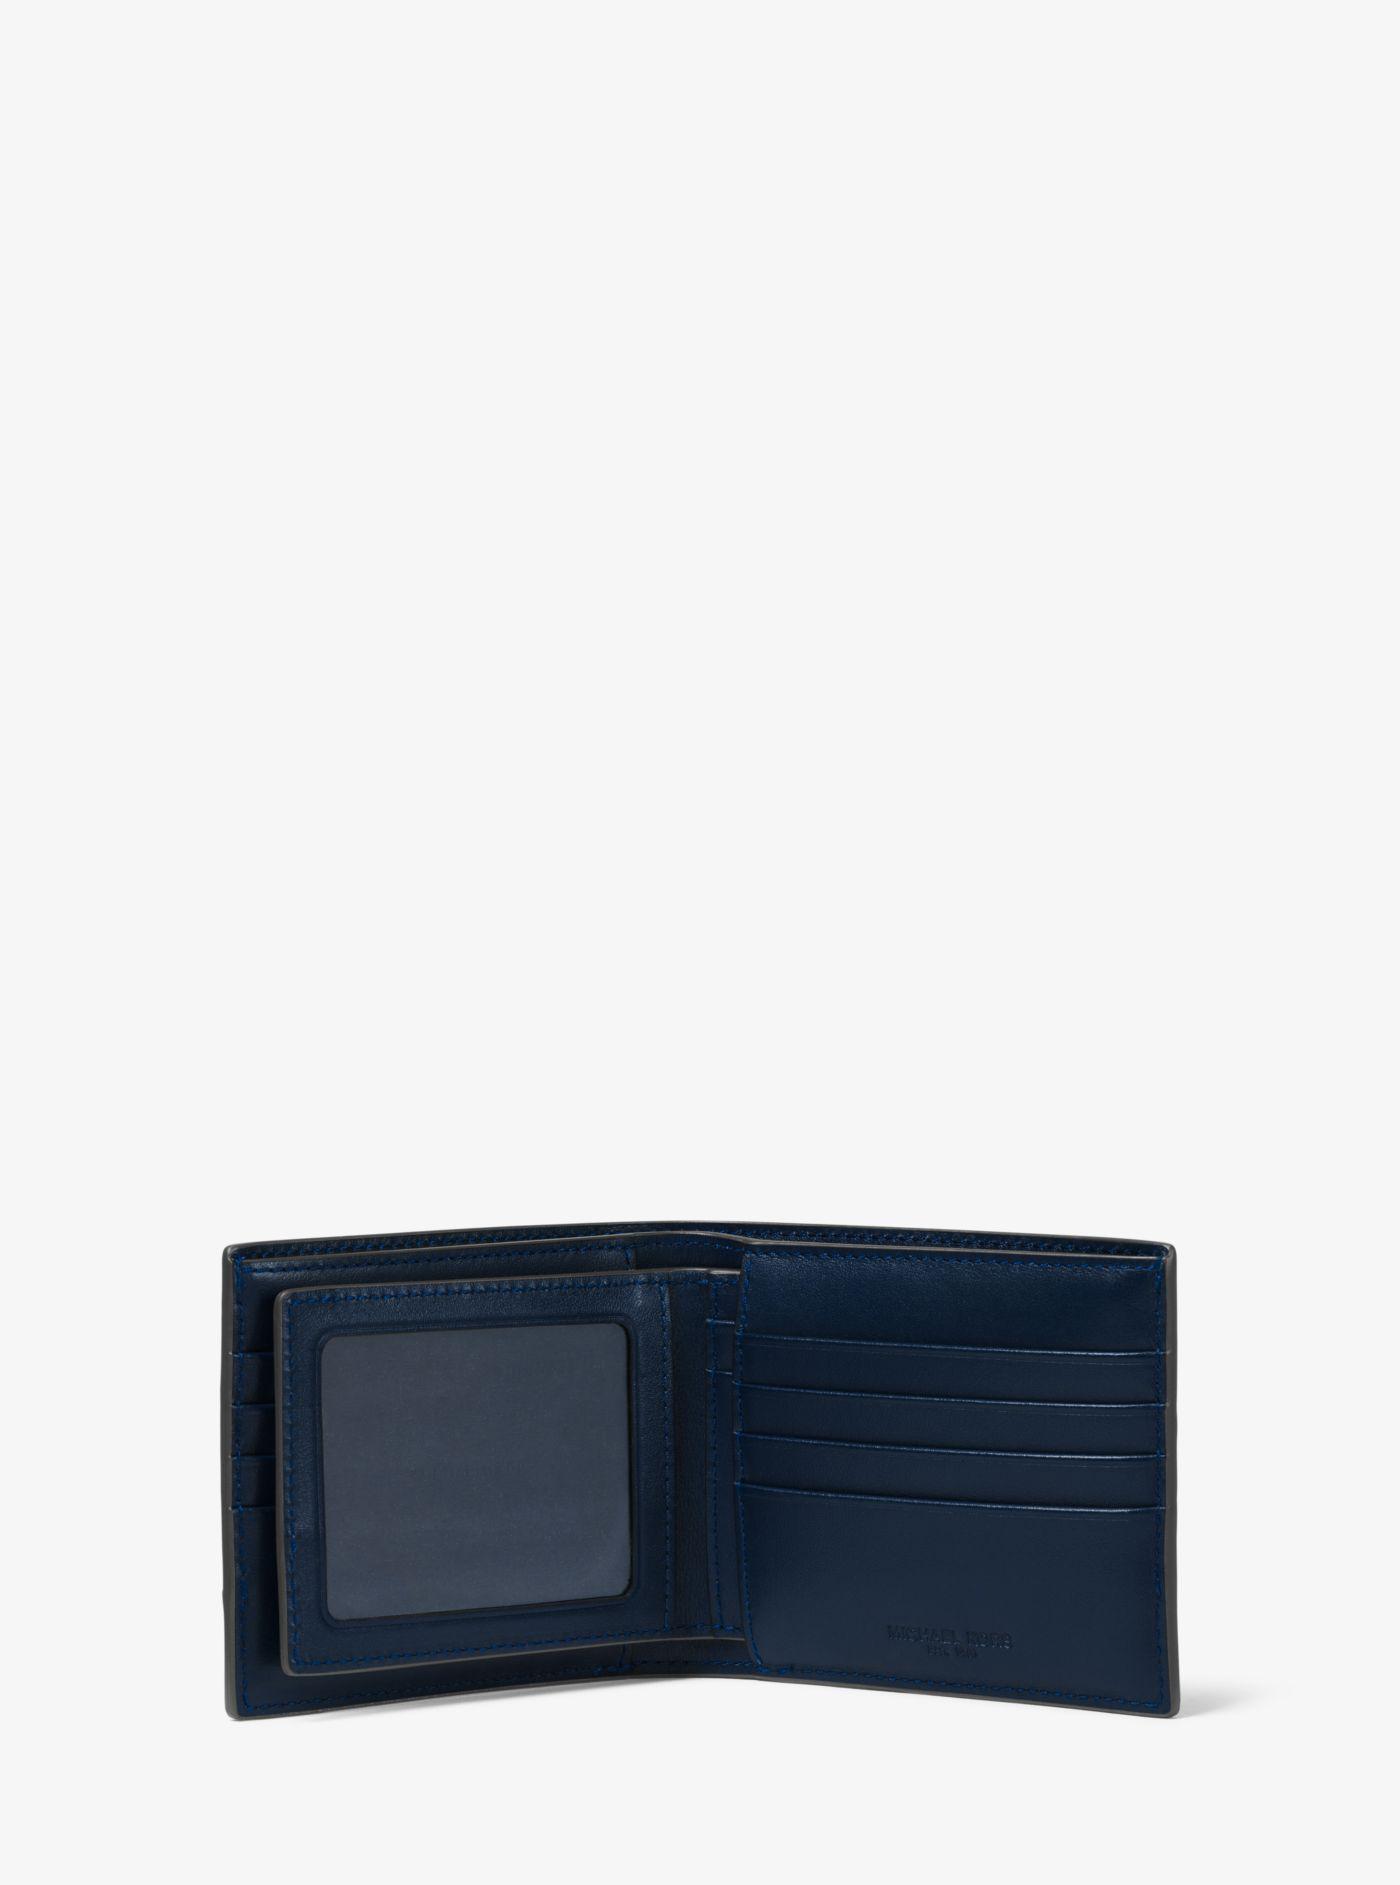 95d4712f61fa Michael Kors - Blue Harrison Crocodile-embossed Leather Id Billfold Wallet  for Men - Lyst. View fullscreen